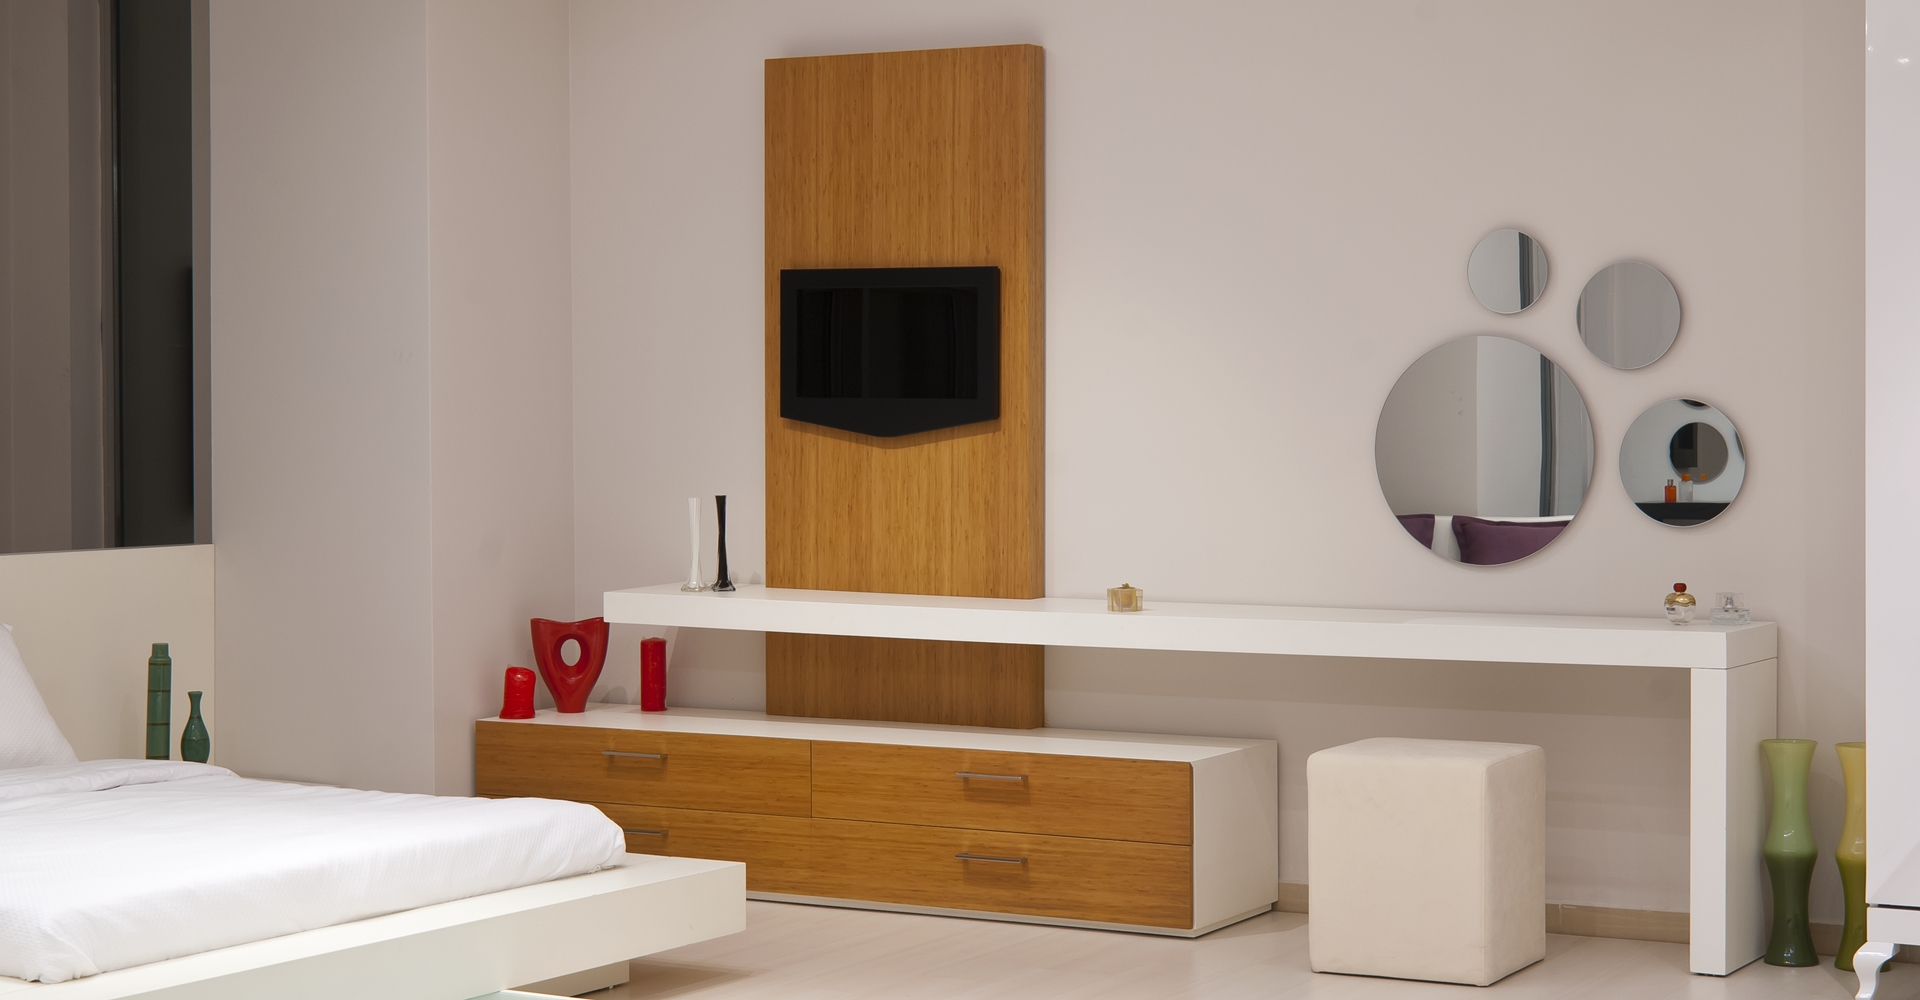 Image Result For Bedroom Dressing Table